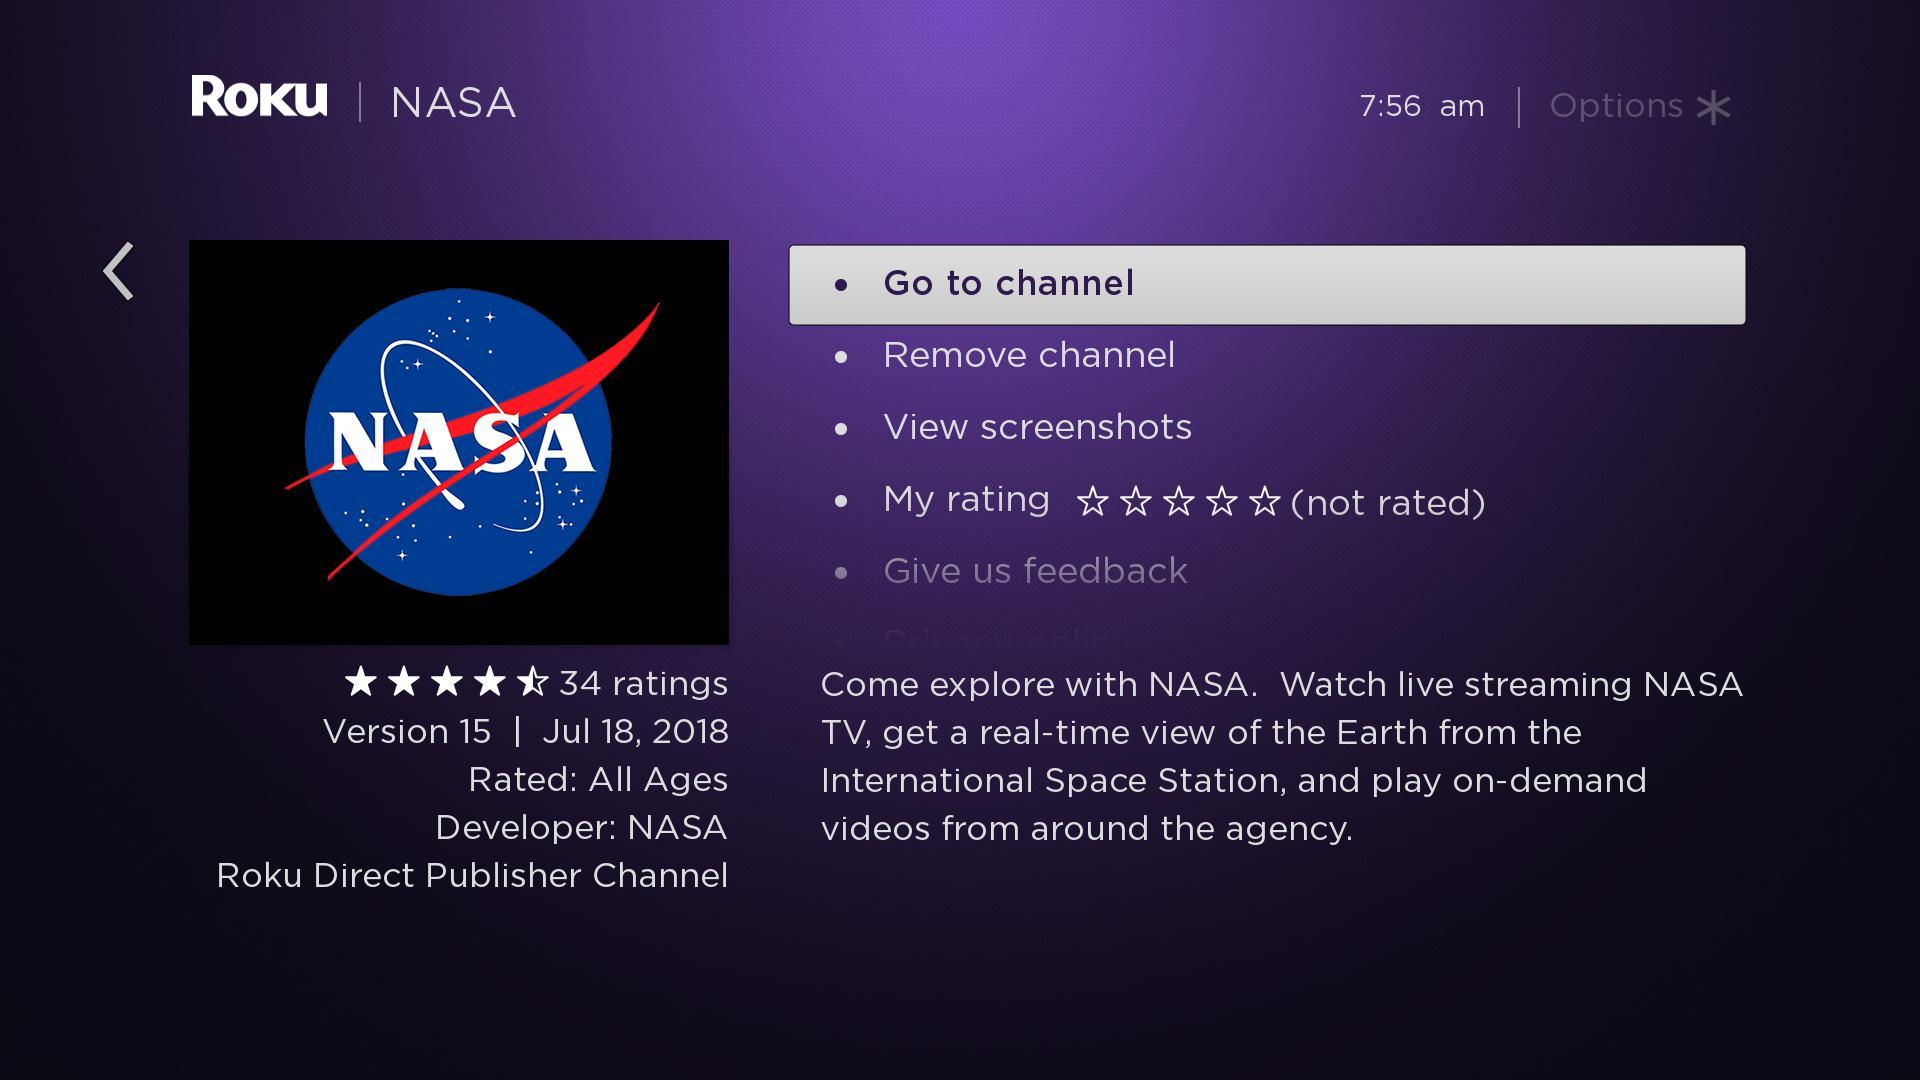 Nasa launches channel for roku nasa nasa launches channel for roku publicscrutiny Images